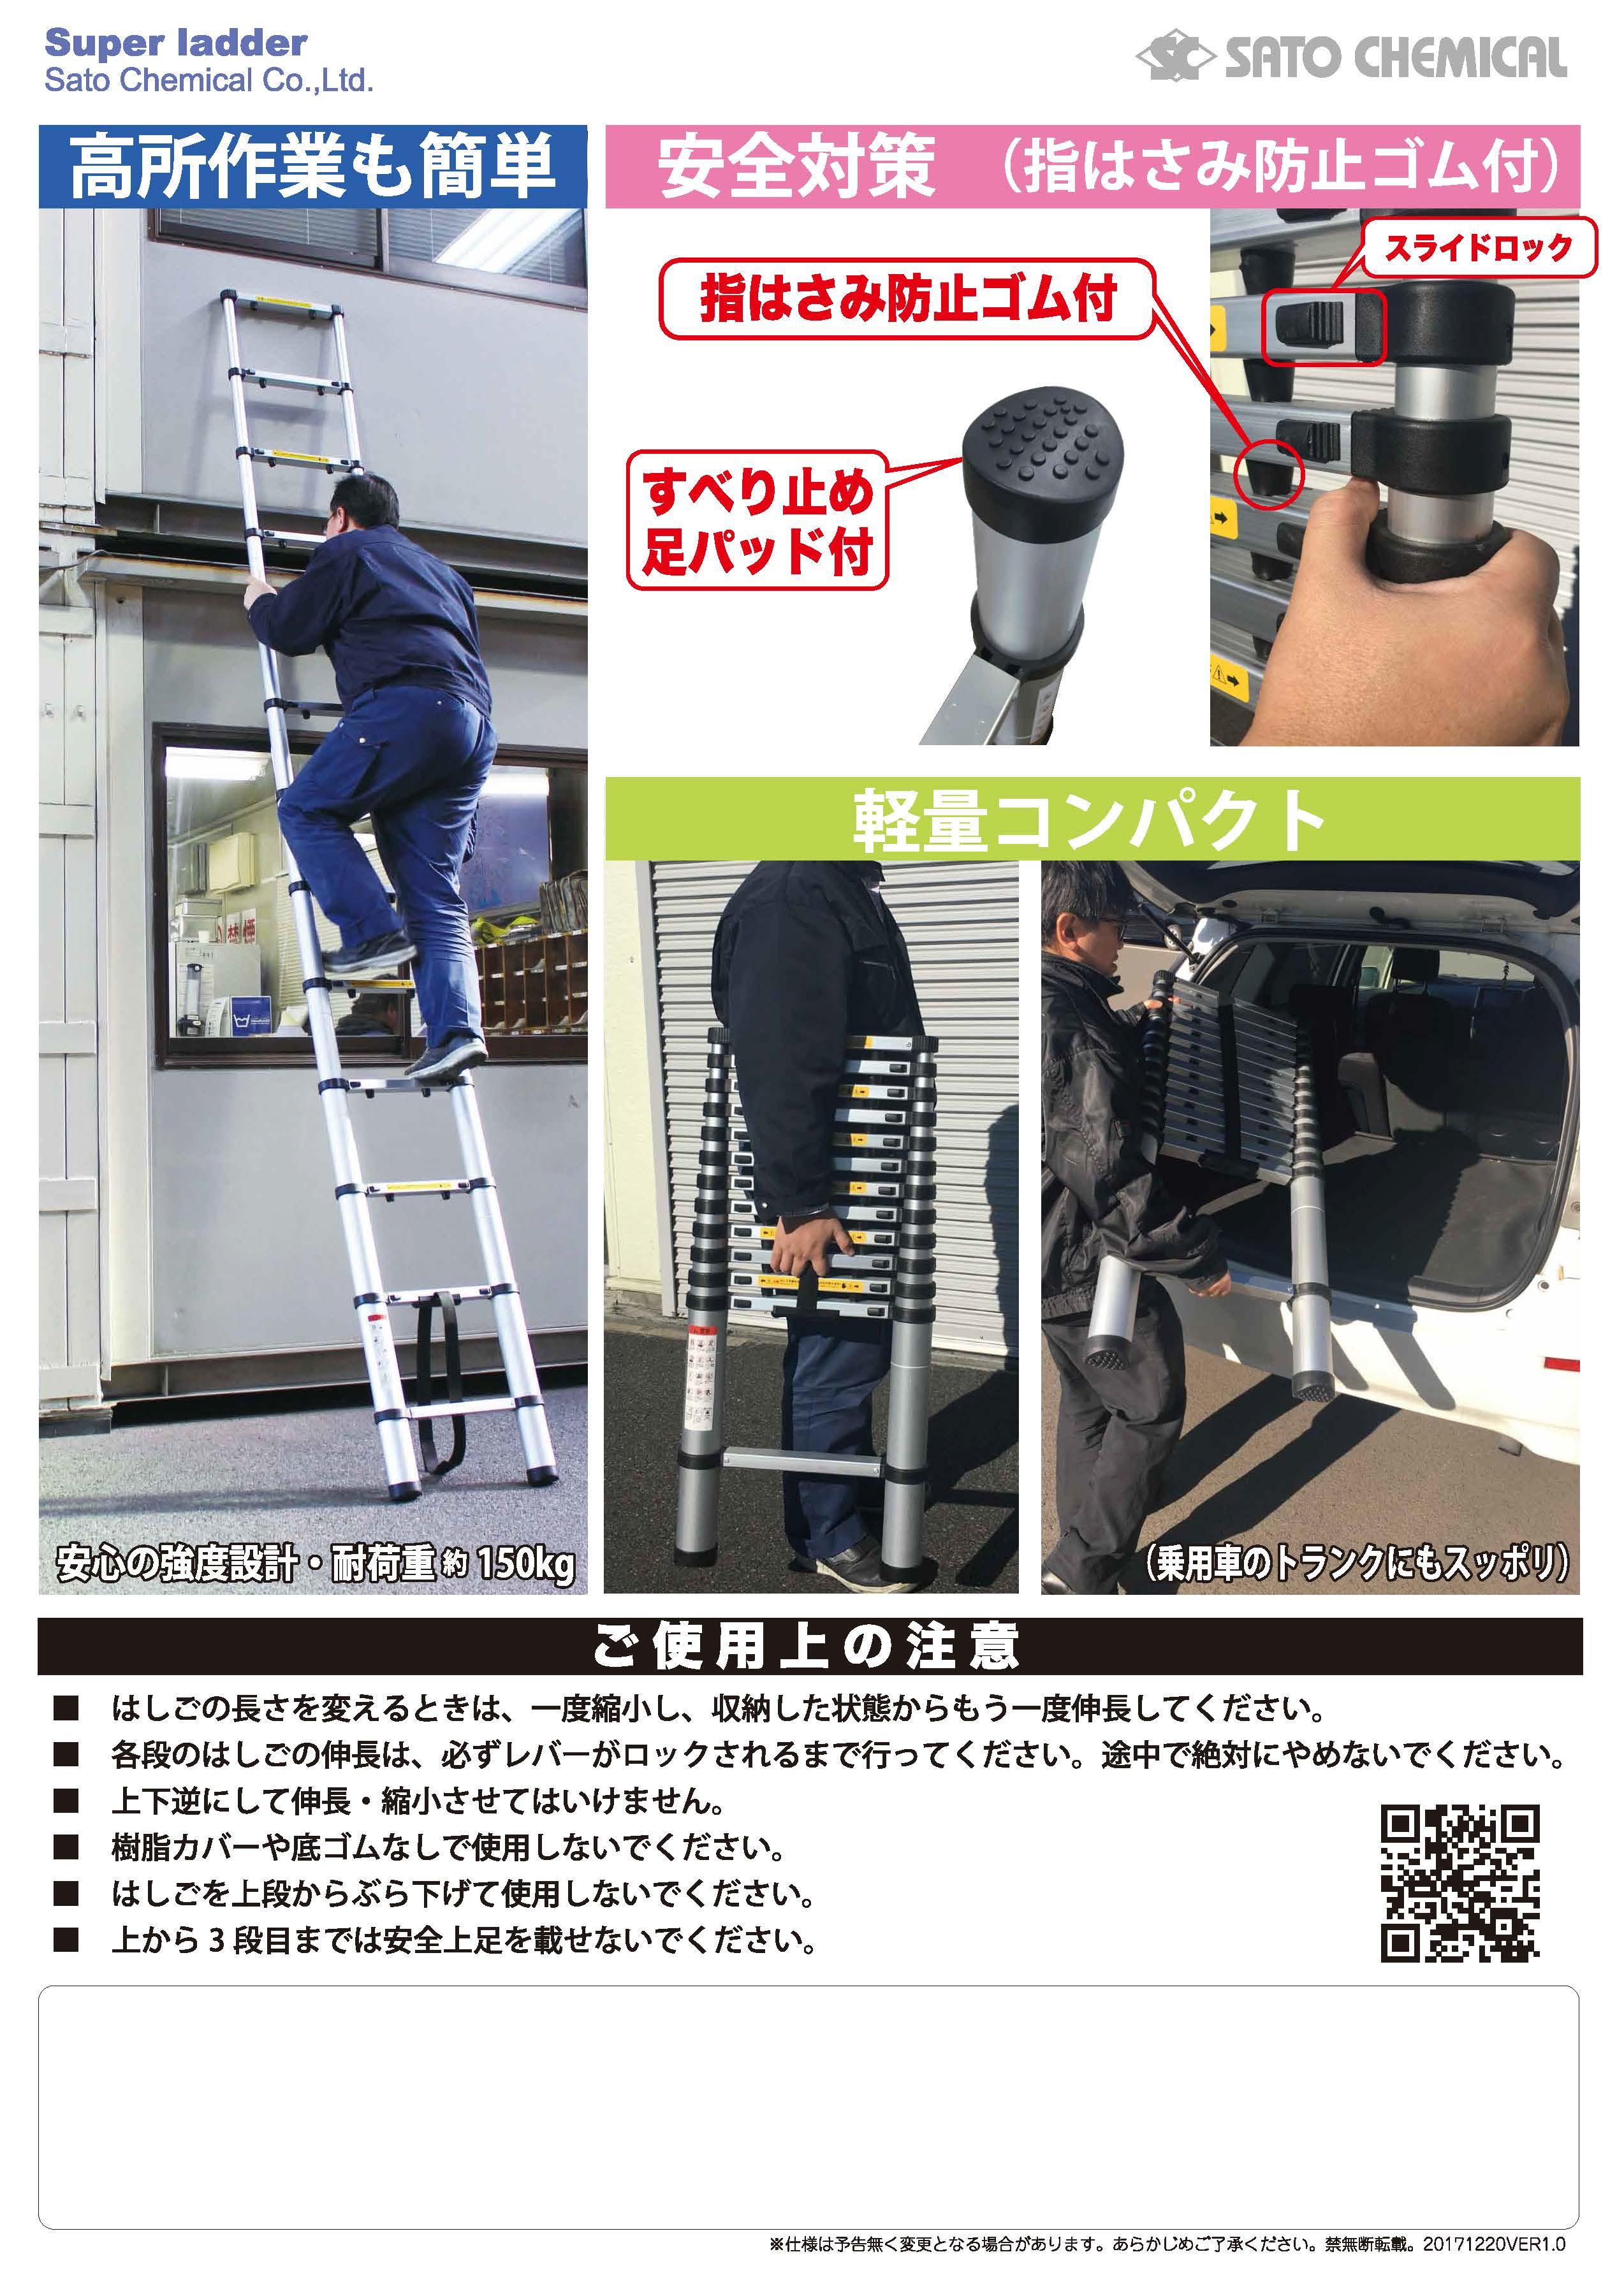 08_ladder_ページ_2